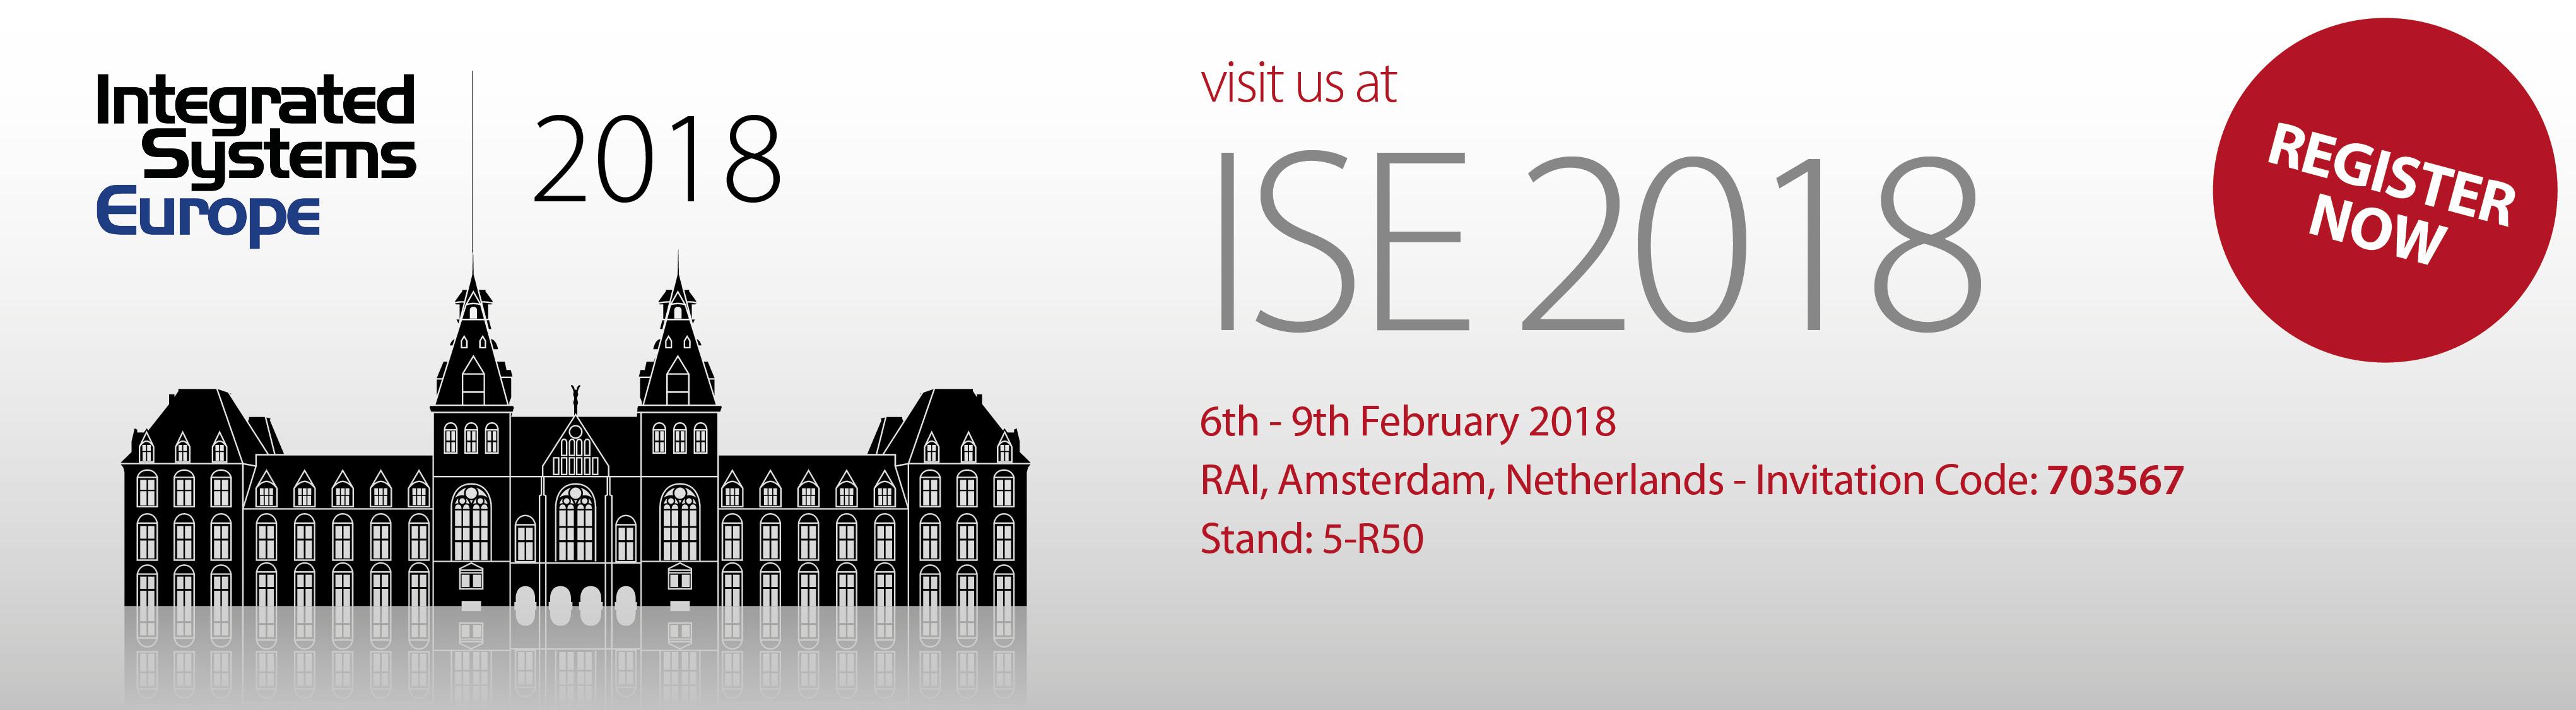 Visit us at ISE 2018